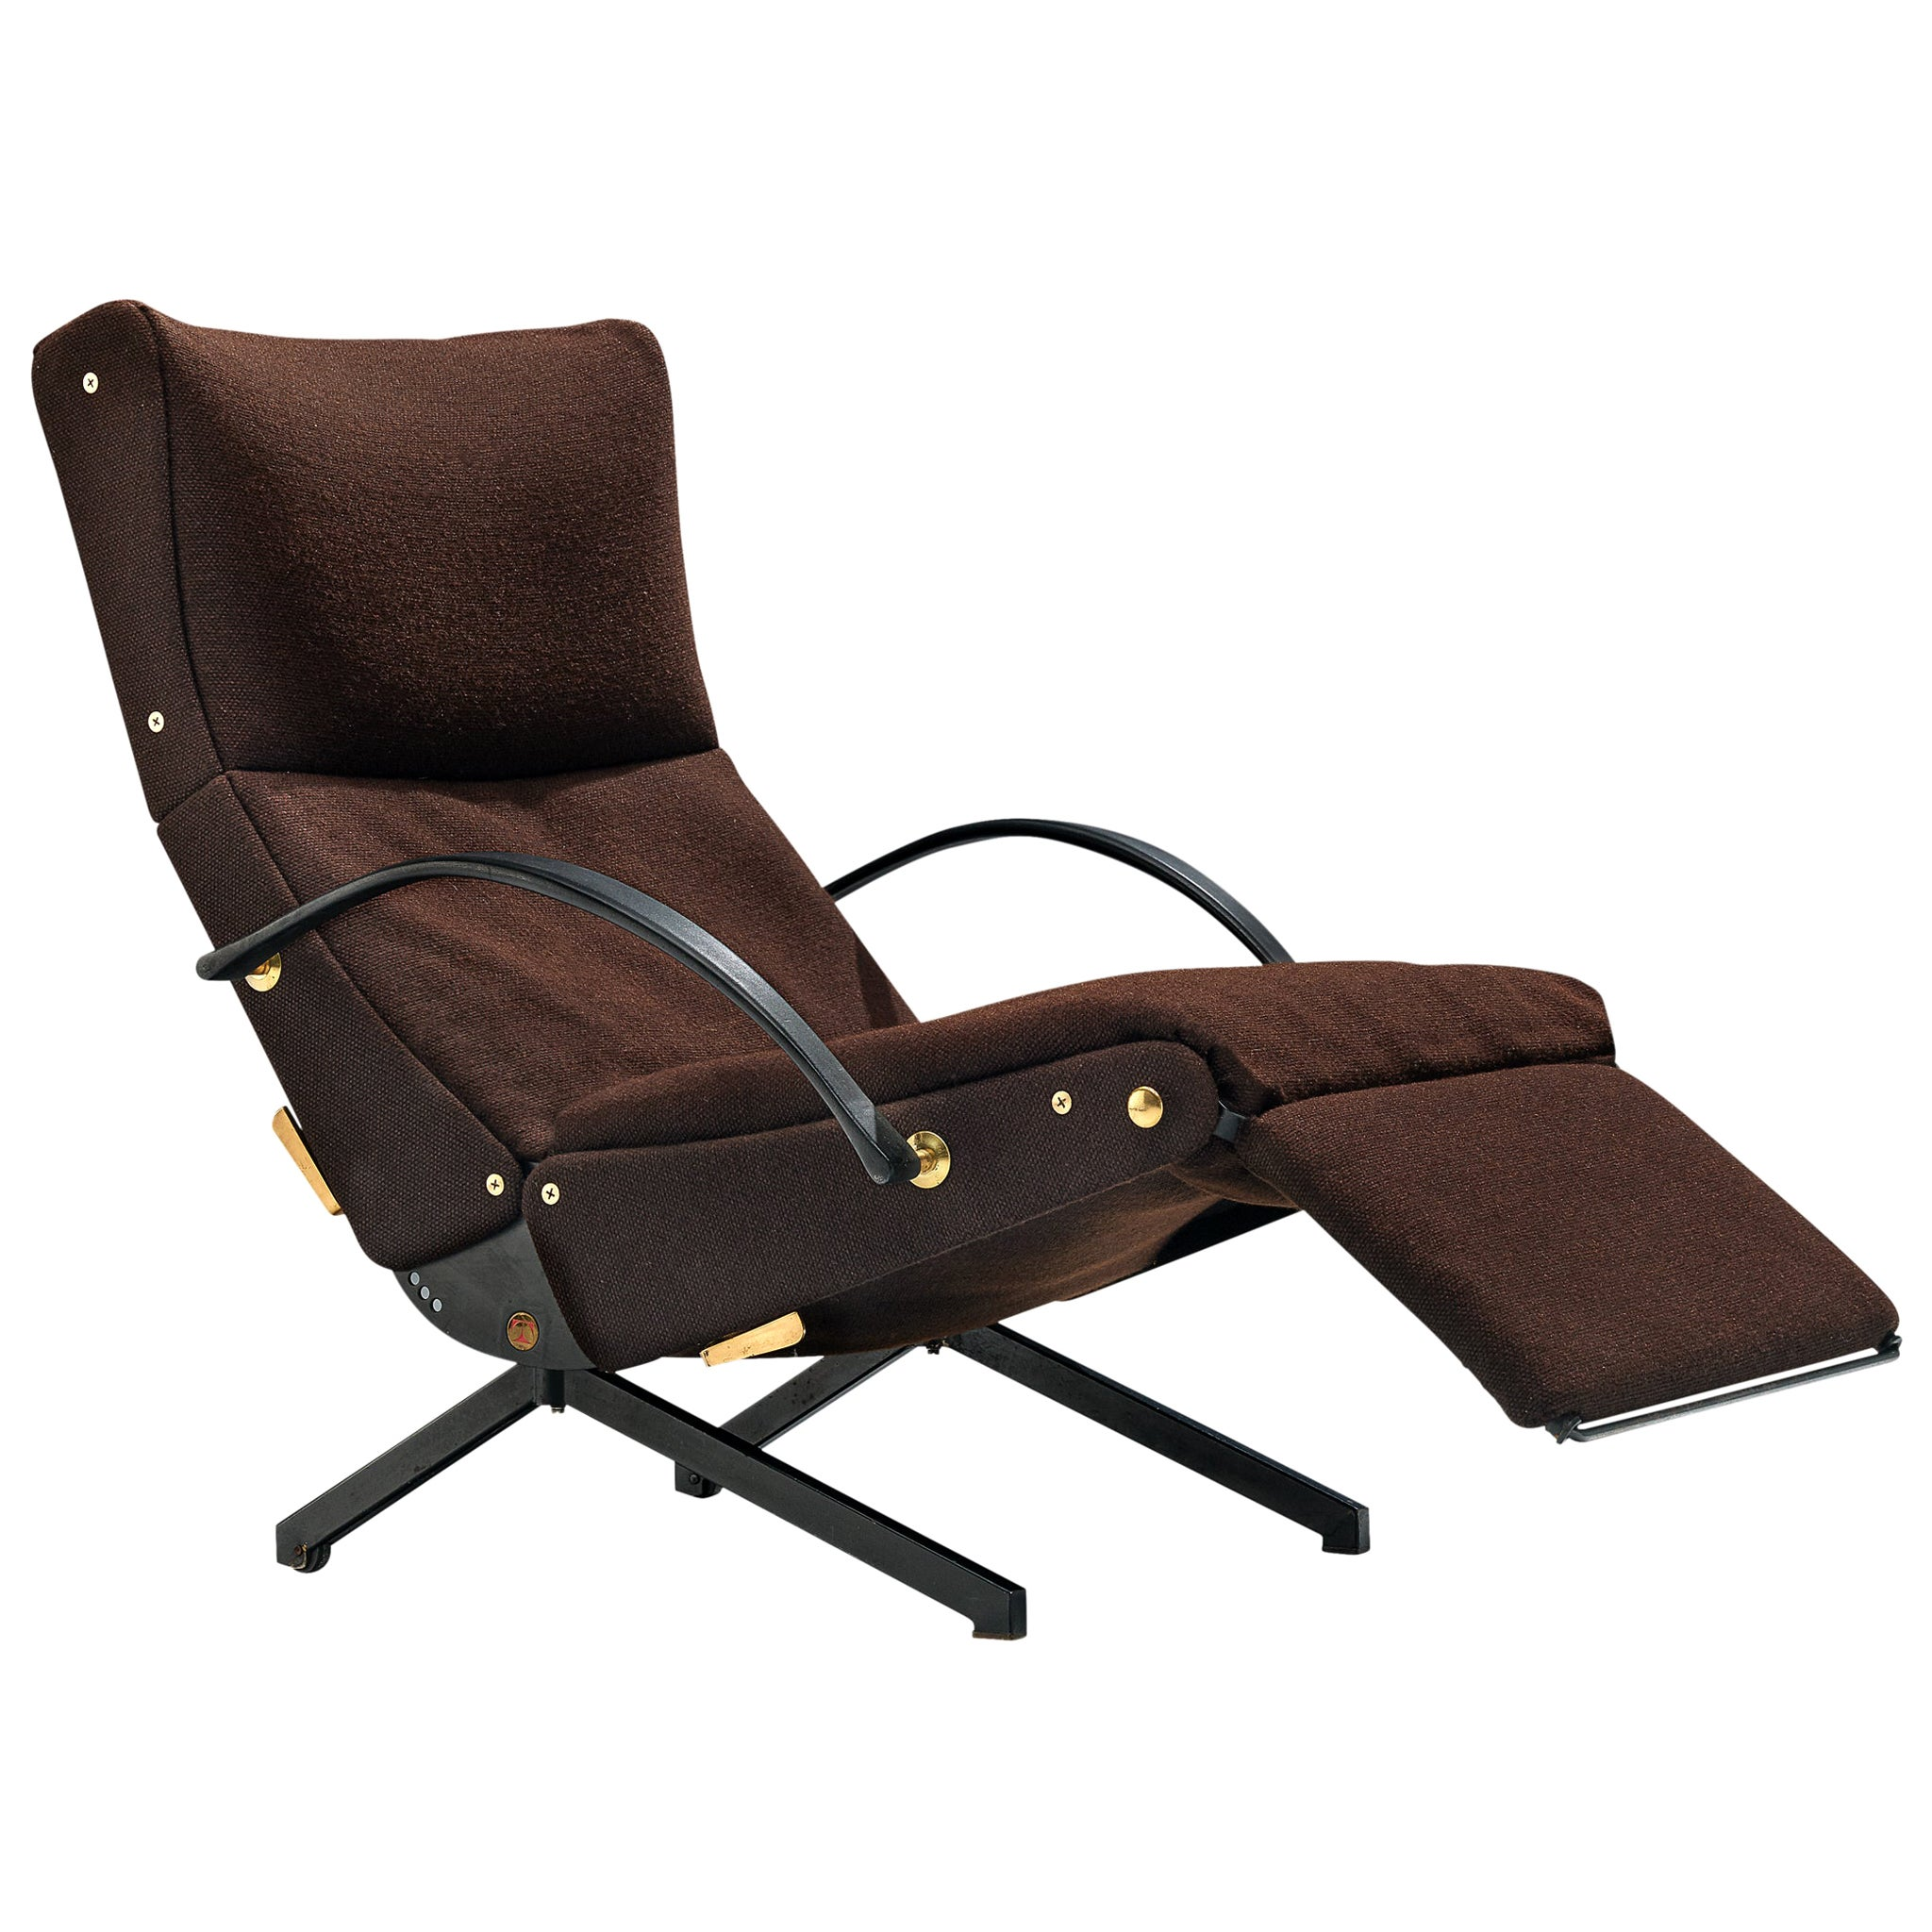 Osvaldo Borsani for Tecno 'P40' Lounge Chair